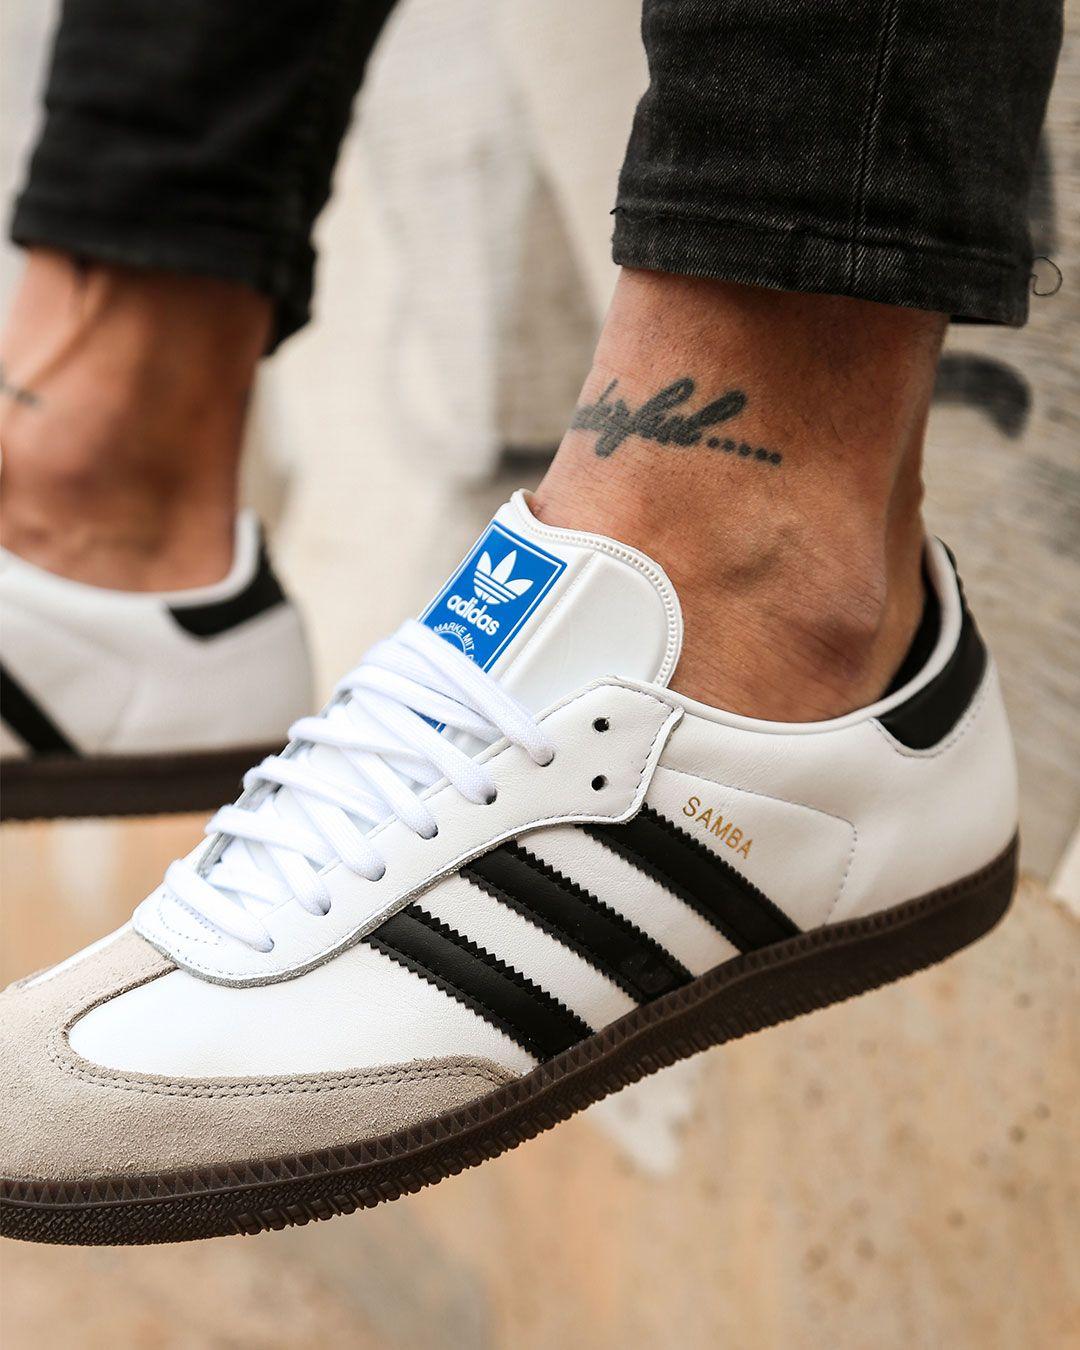 Old Skool | Adidas samba, Adidas y Zapatillas